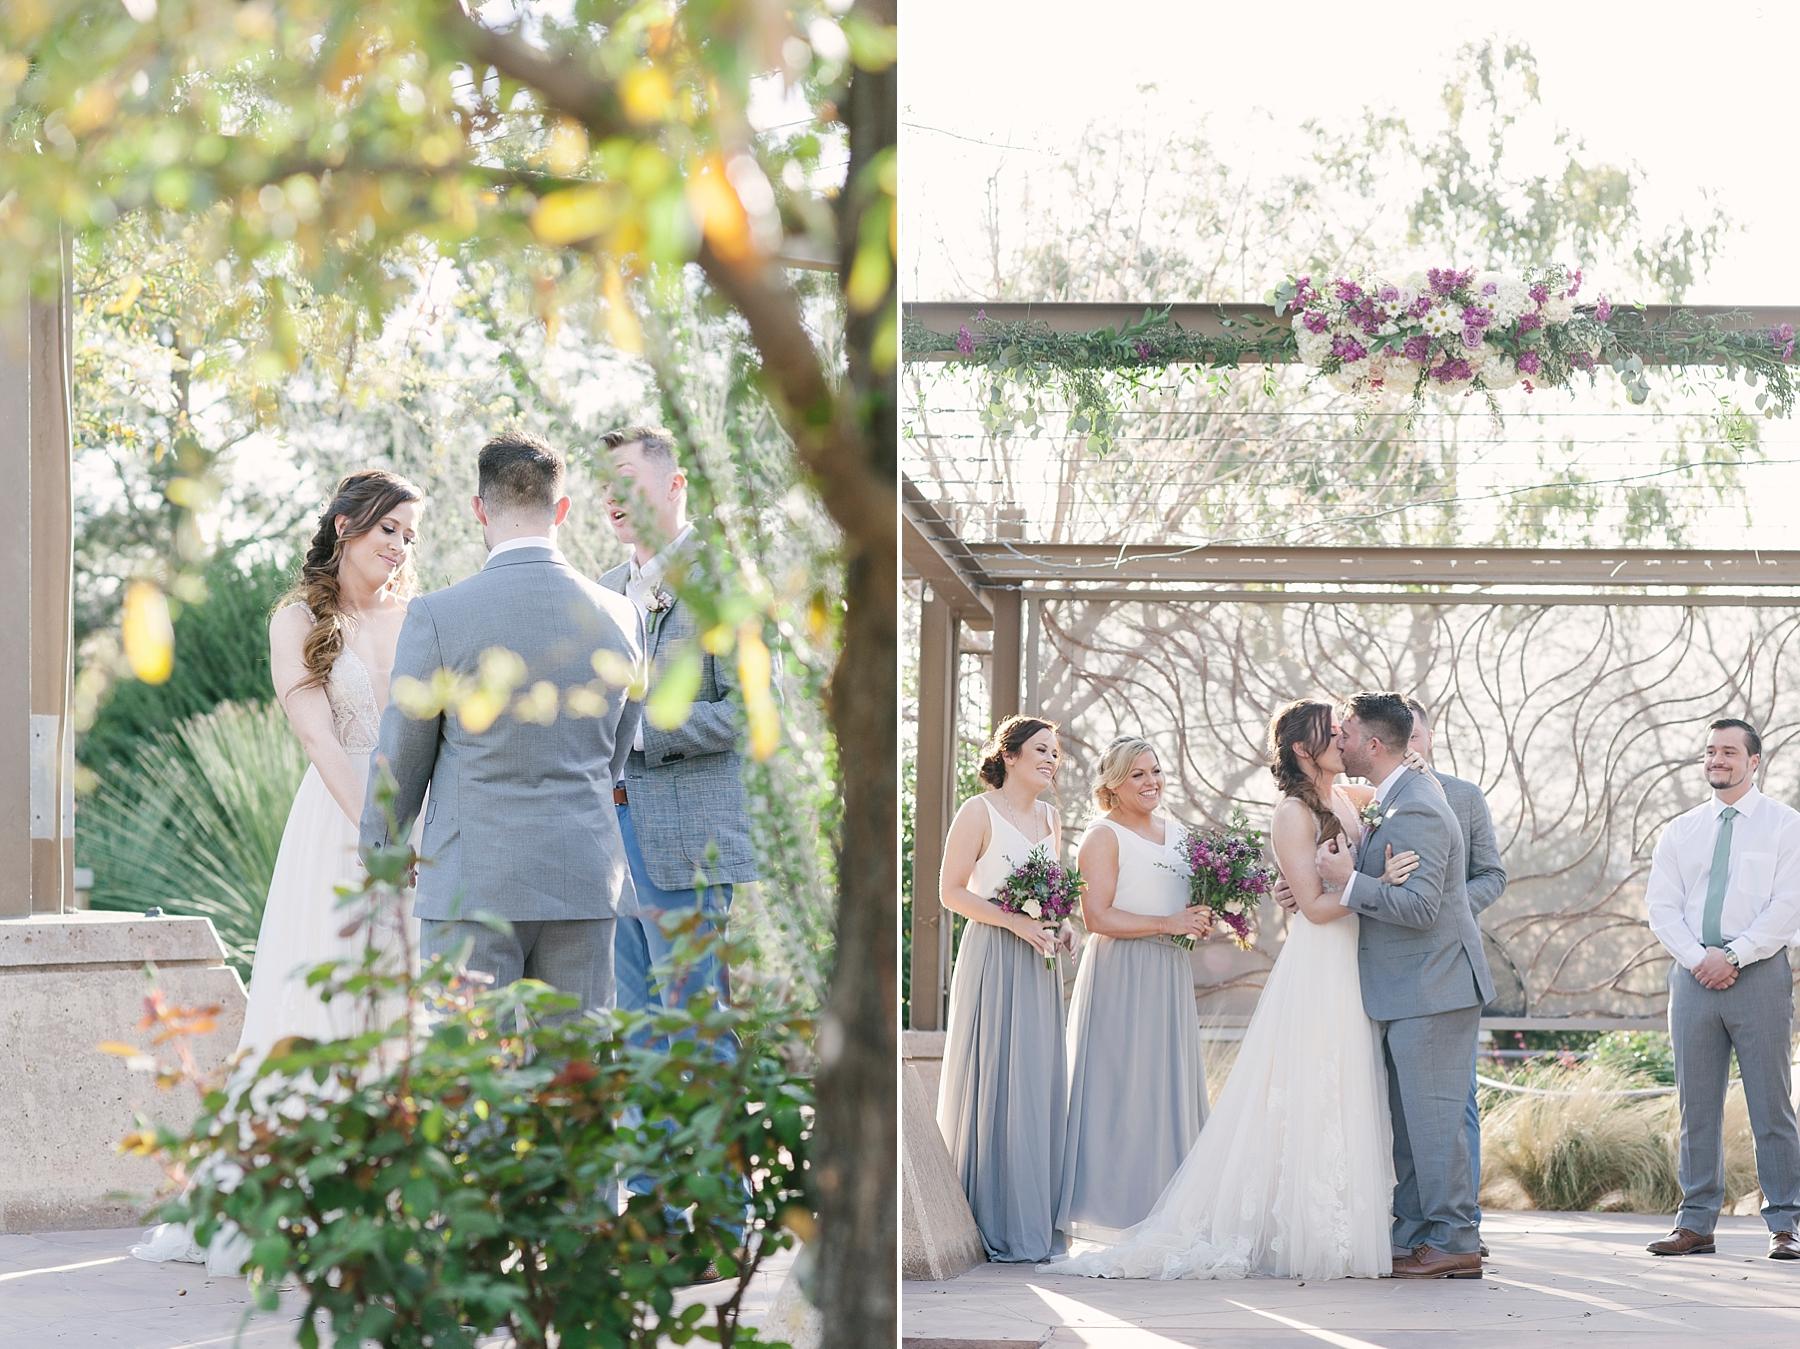 springs-preserve-wedding-las-vegas-destination-photography-the-emerics-27.jpg